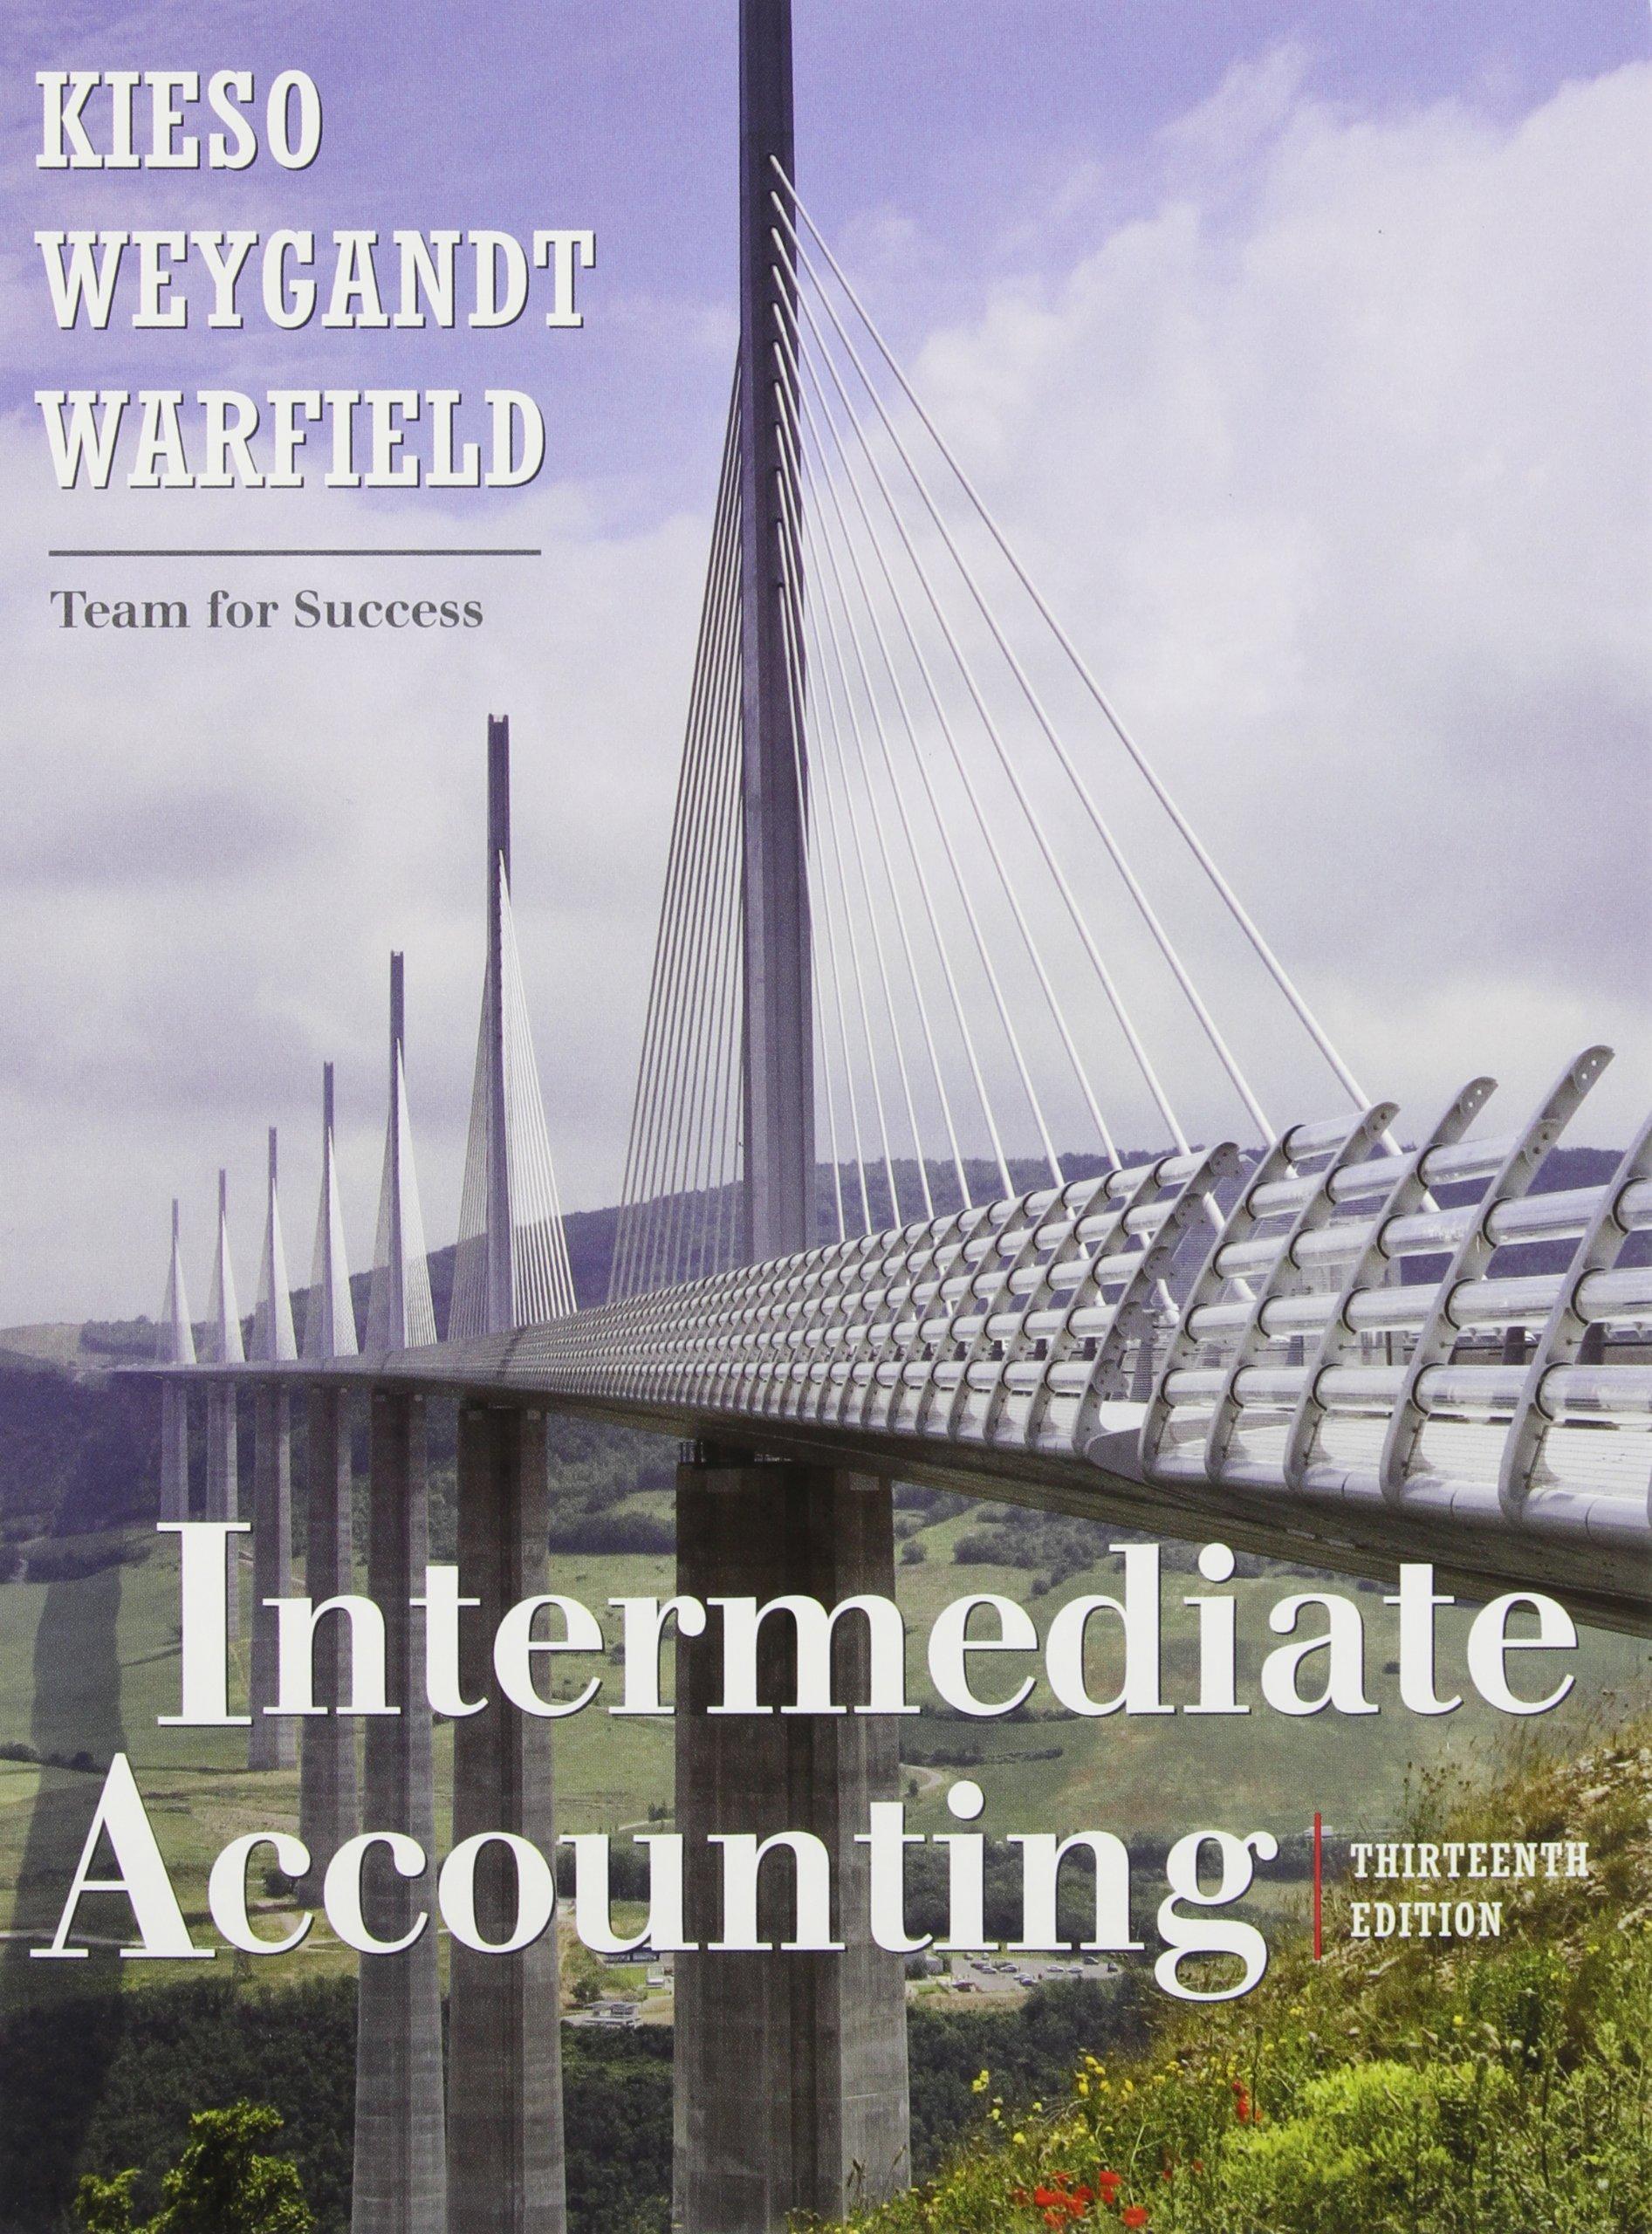 Intermediate accounting by kieso, weygandt, warfield 13th edition.